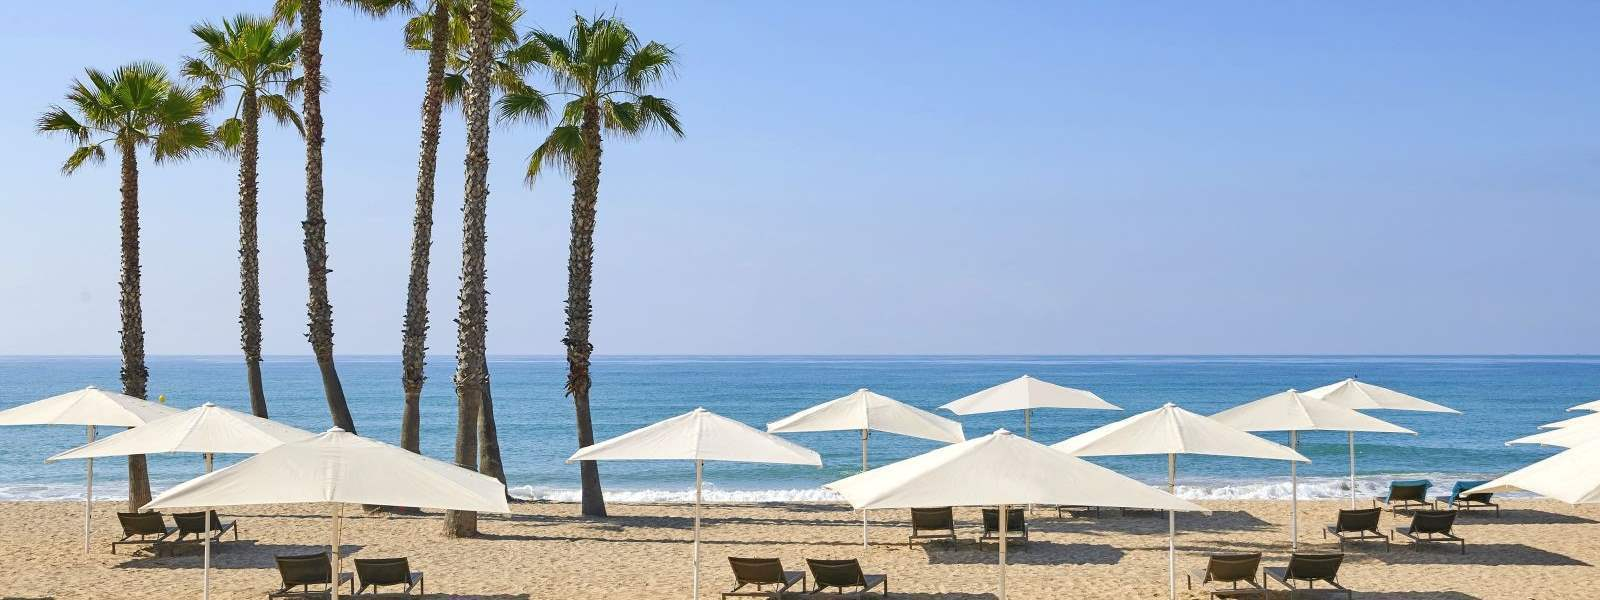 Website fermentumasas el Le Méridien Ra Beach Hotel & Spa